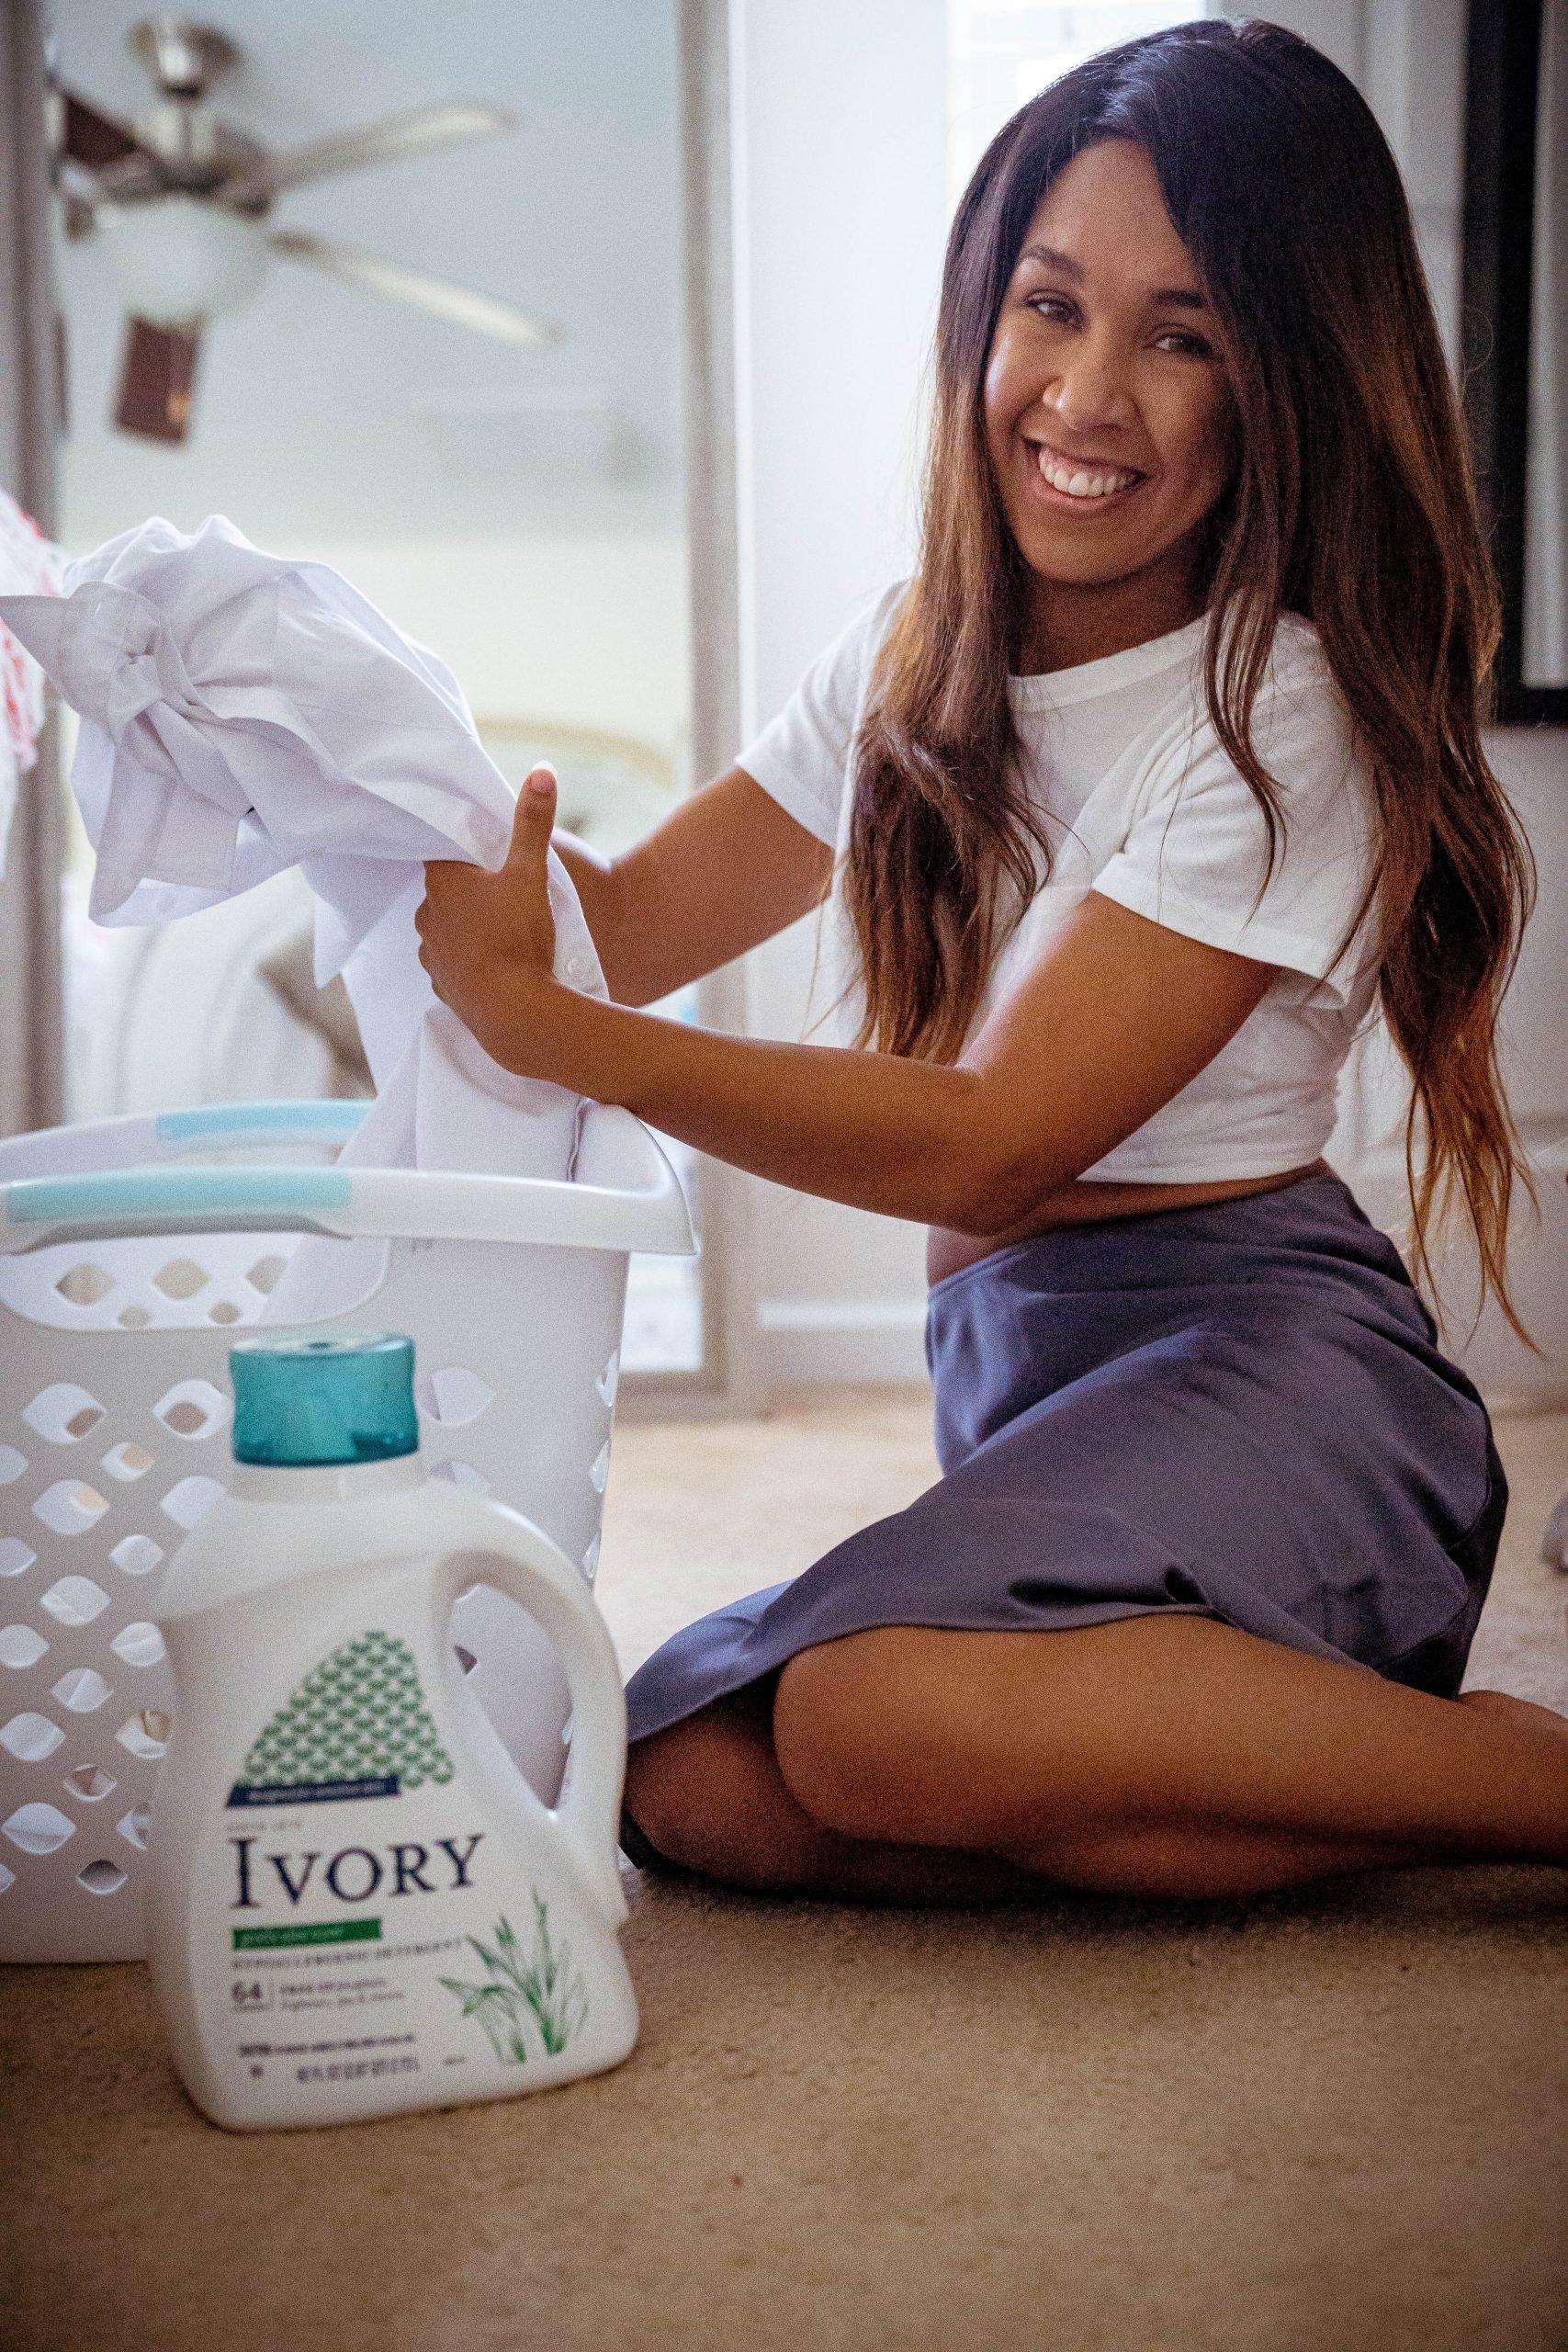 LivingLesh using laundry detergent for eczema